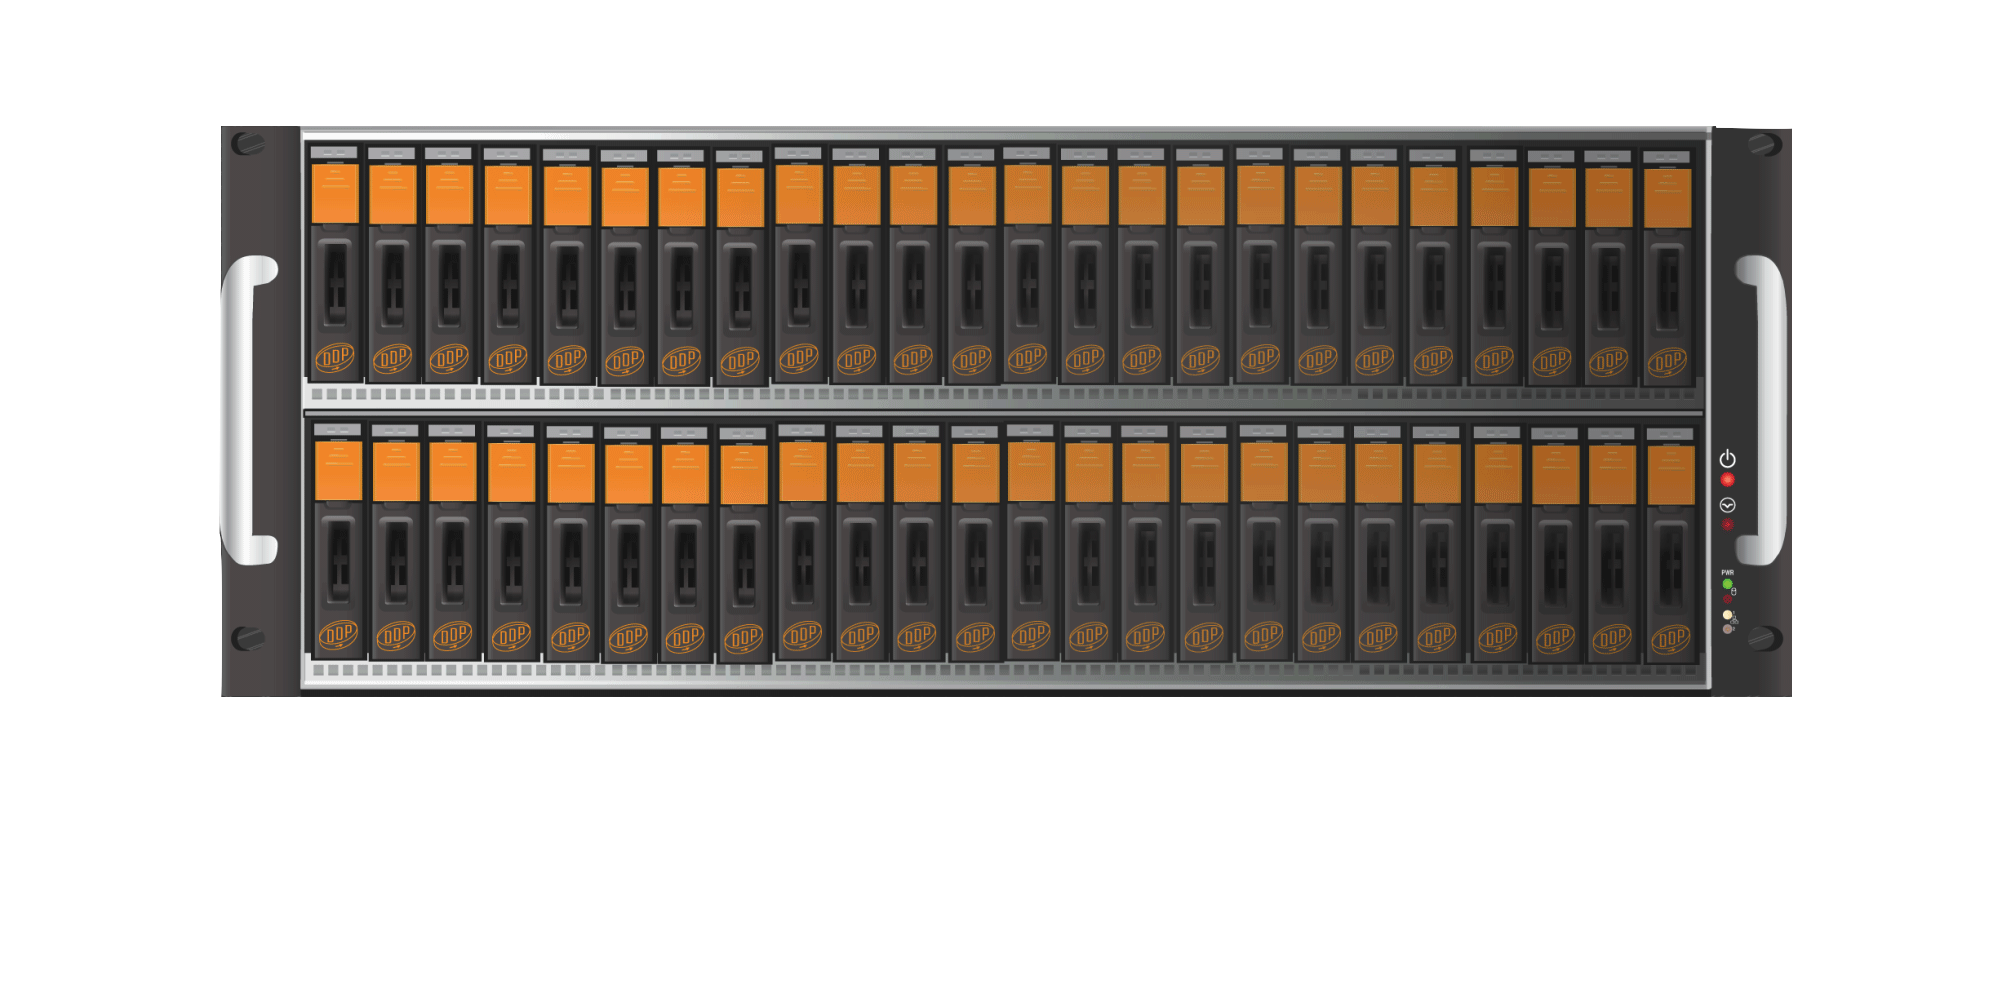 "MINIDDP & MICRODDP 系列   miniDDP 系列可提供2,5"" HDD和/或SSDs,microDDP系列有8个SSDs。DDP卷使用iSCSI协议和以太网连线。为了能让所有人同时在此类DDP卷上进行读写,Ardis科技公司开发了AVFS技术。  >> 更多"